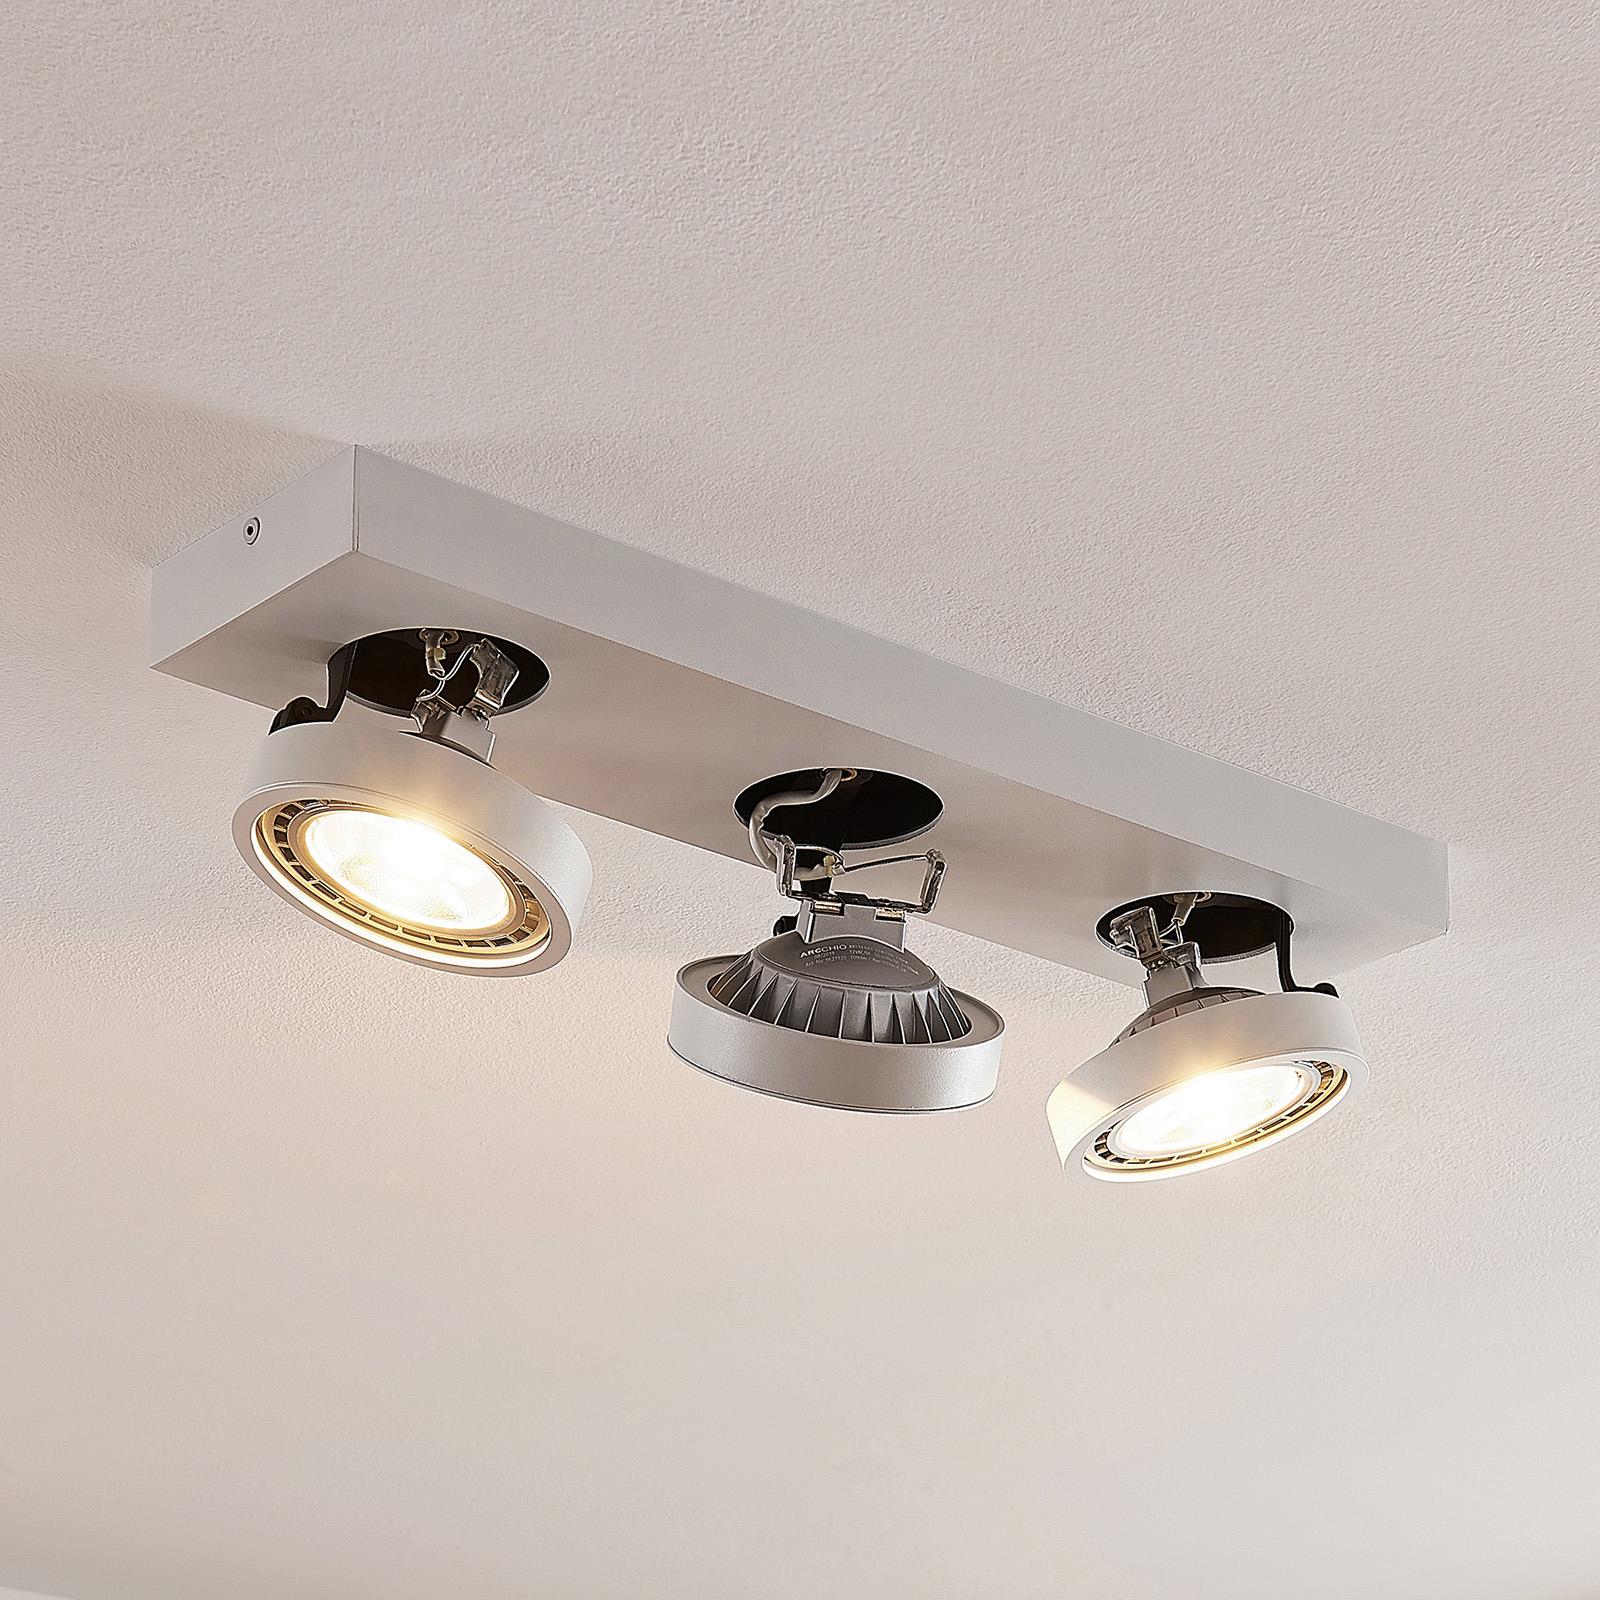 LED plafondlamp Negan in wit, drie lampjes